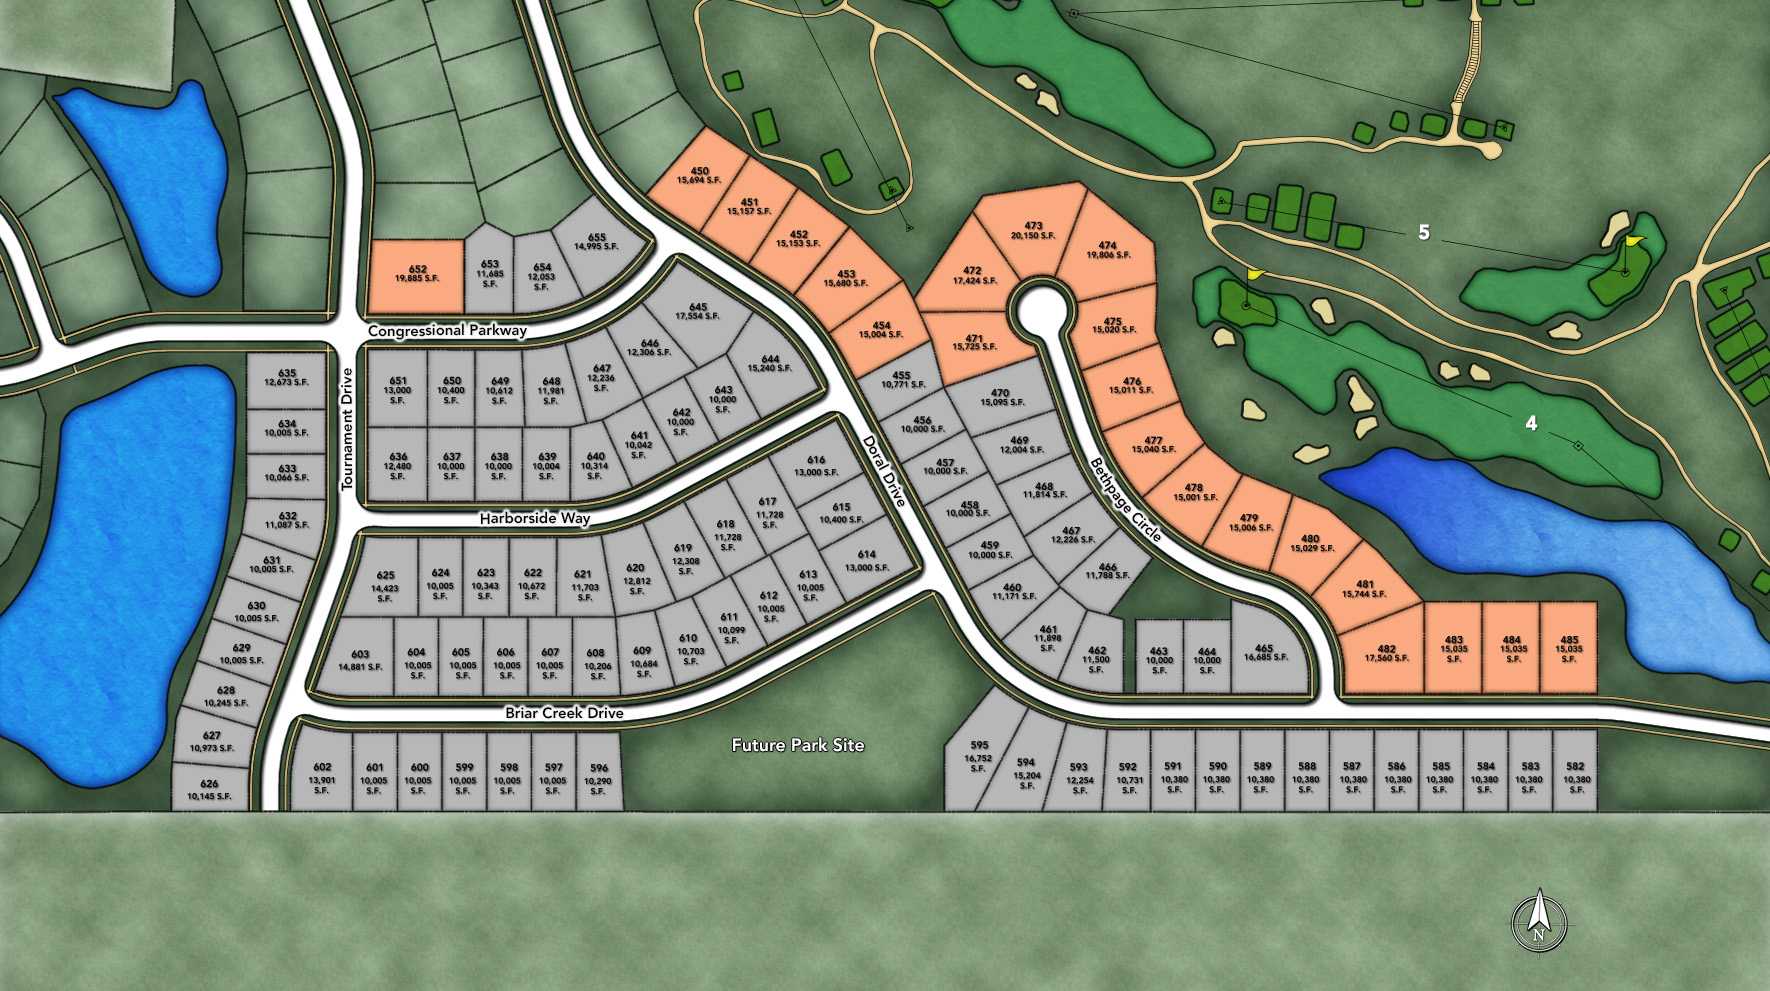 Bowes Creek Country Club Site Plan